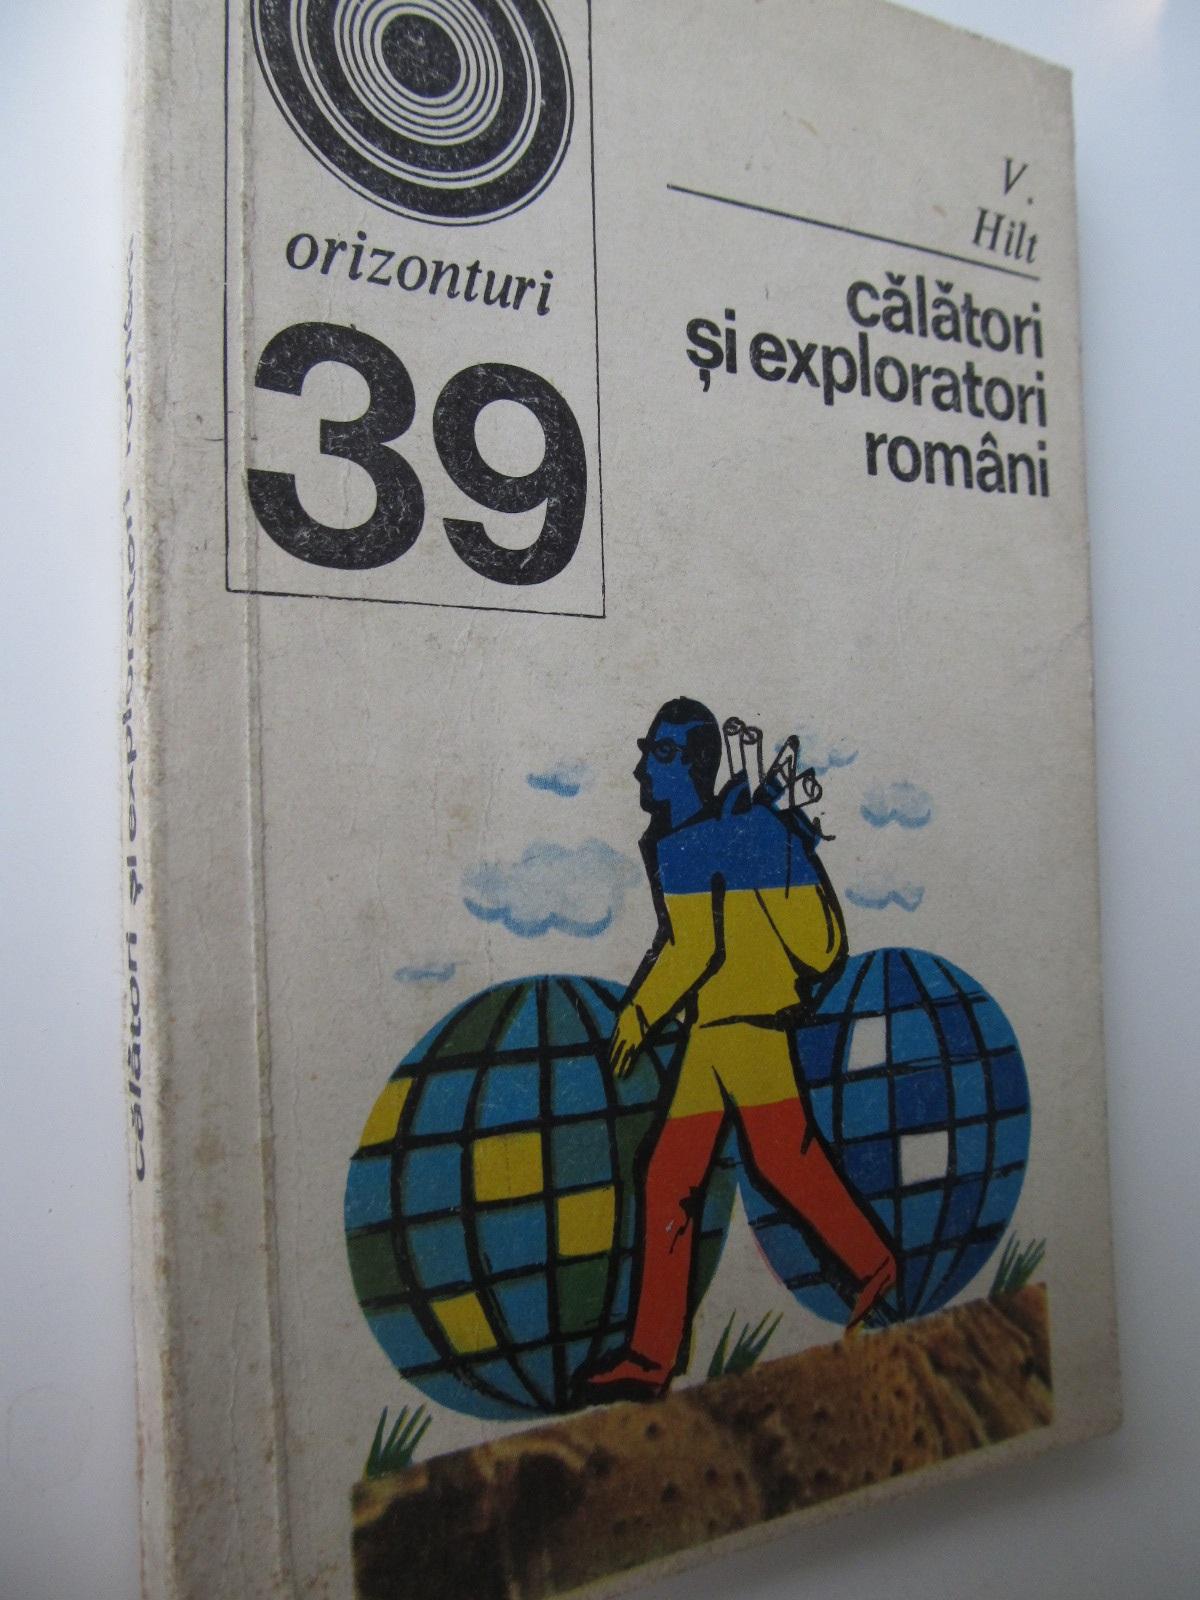 Calatori si exploratori romani (39) - V. Hilt | Detalii carte